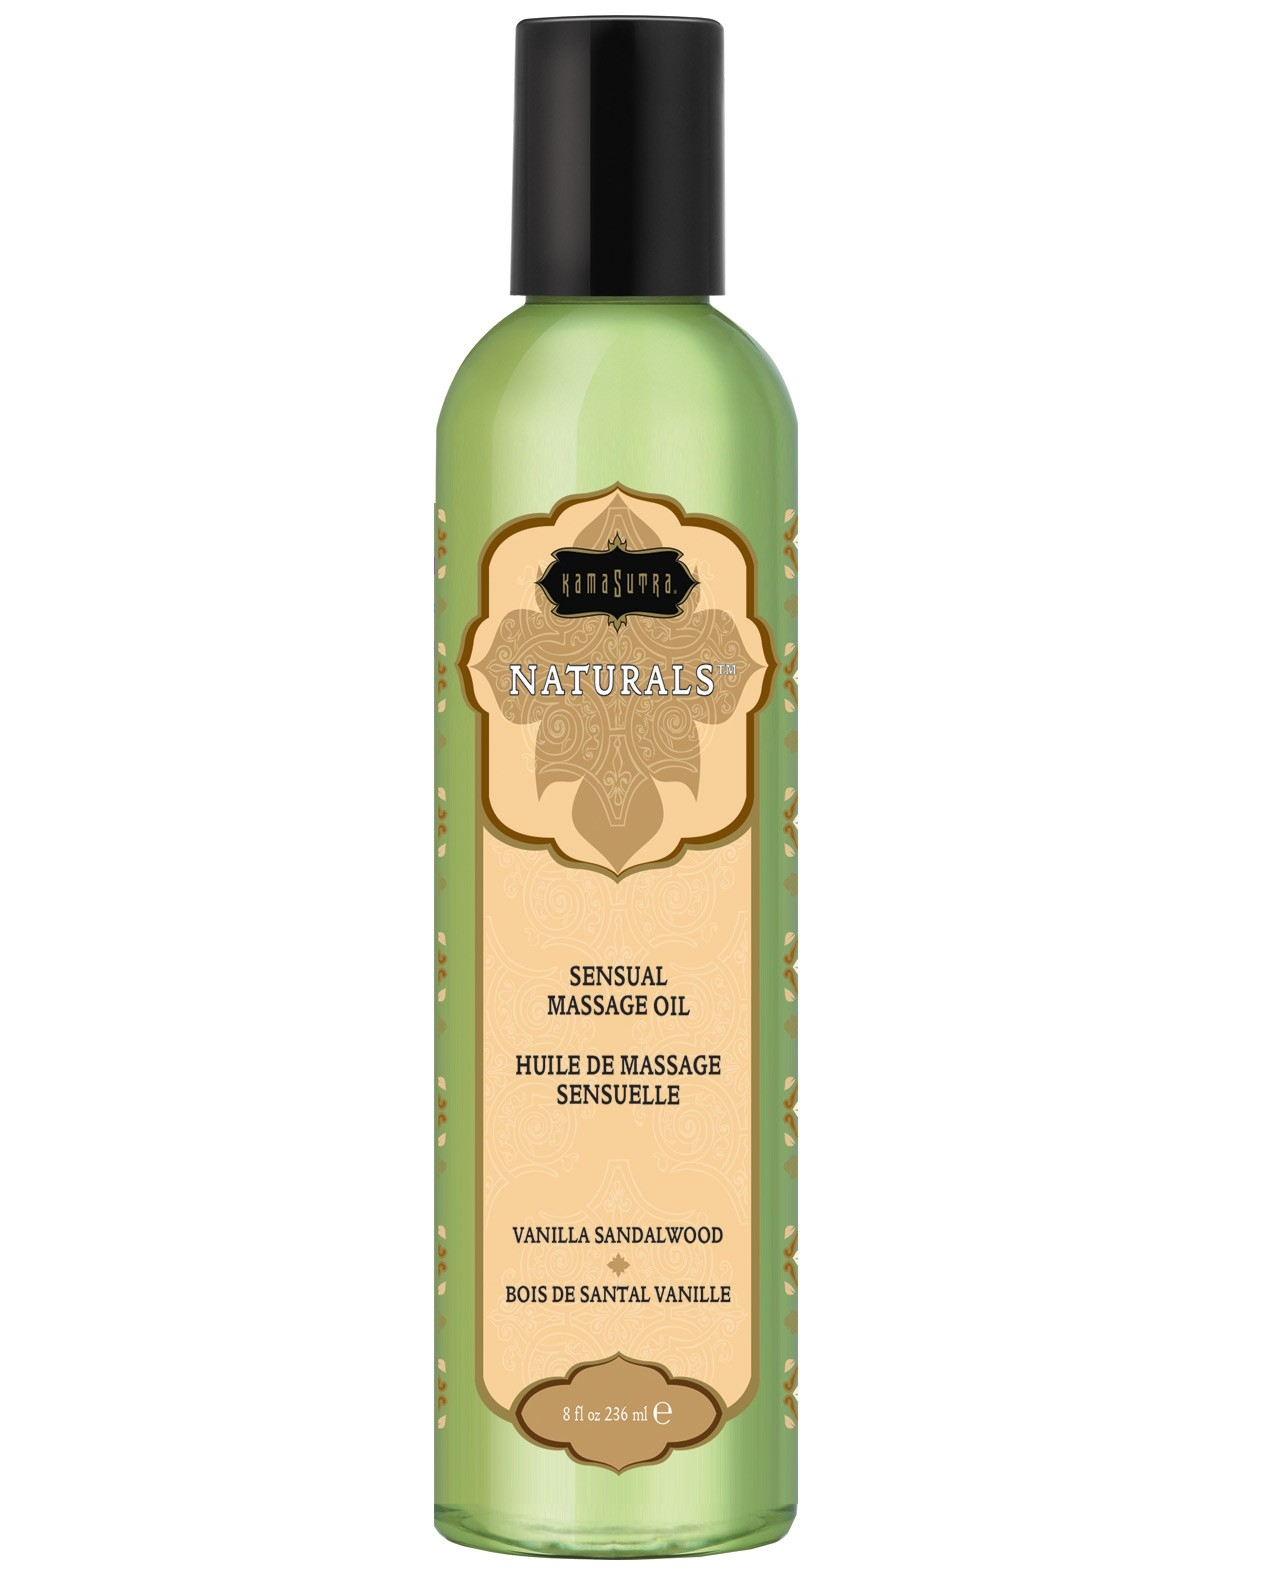 Kama Sutra Naturals Massage Oil - Vanilla Sandlewood